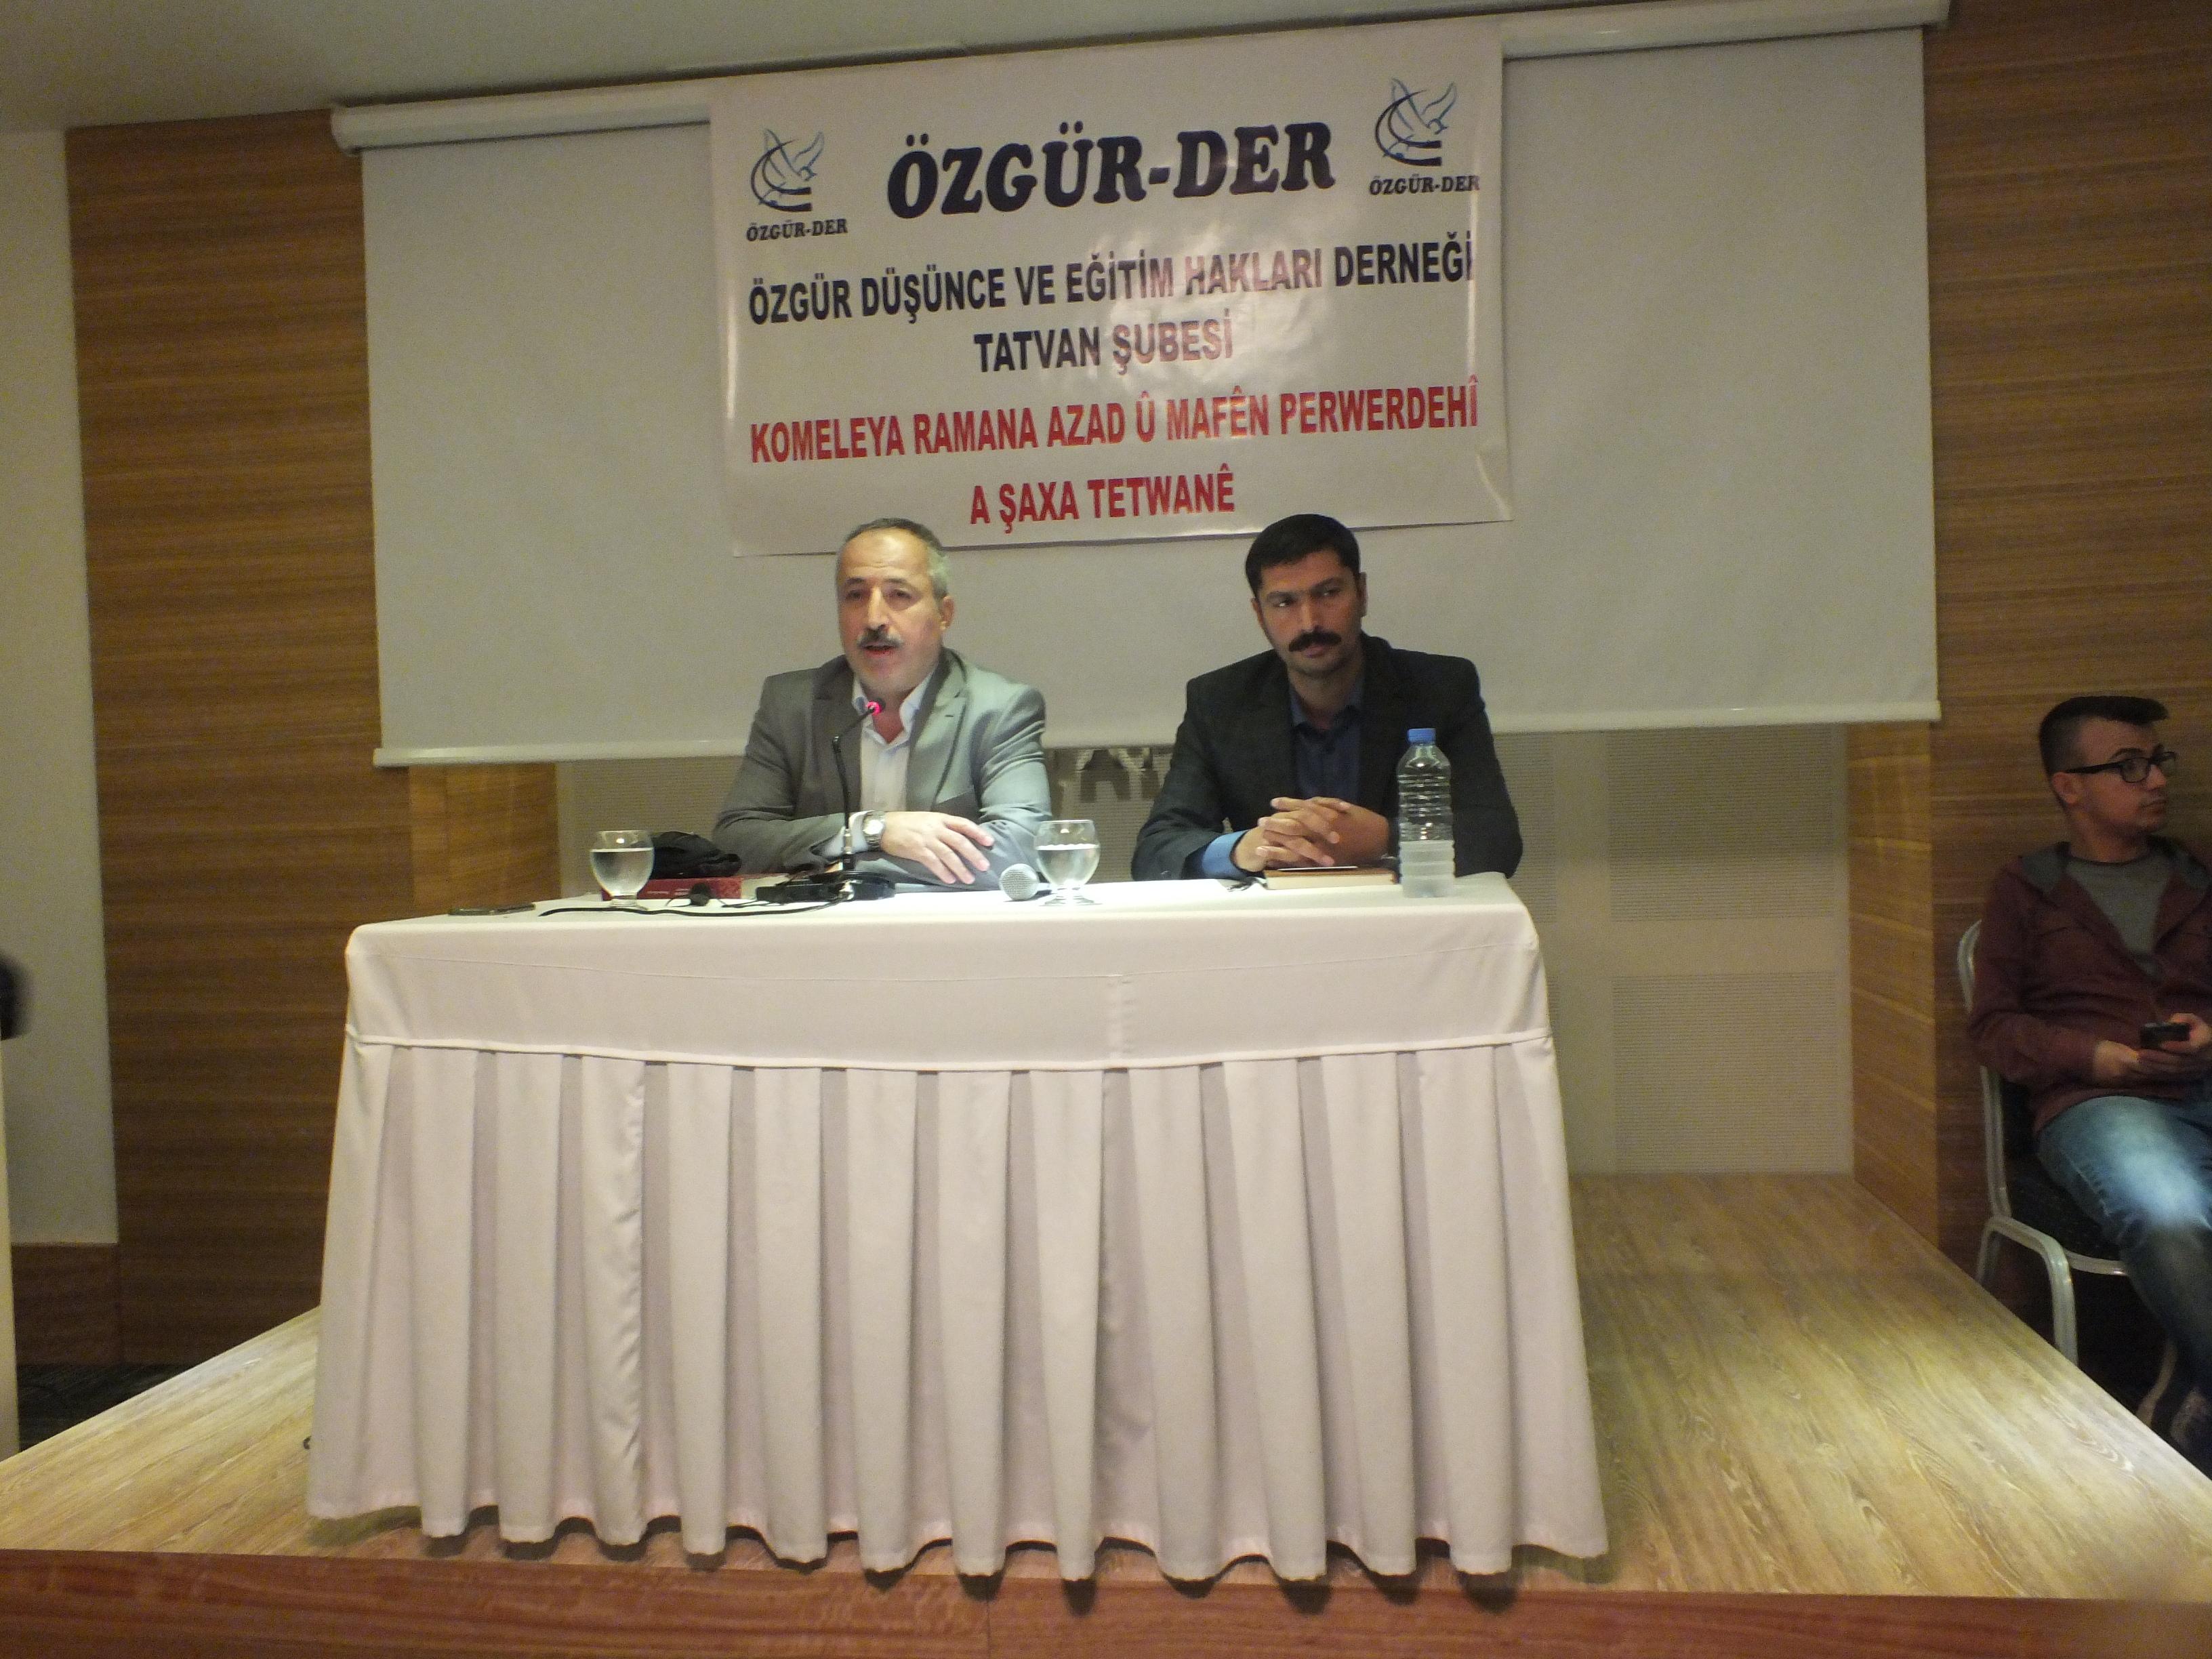 tatvan_ozgur-der_cuma_seminerleri_basladi-(3).jpg